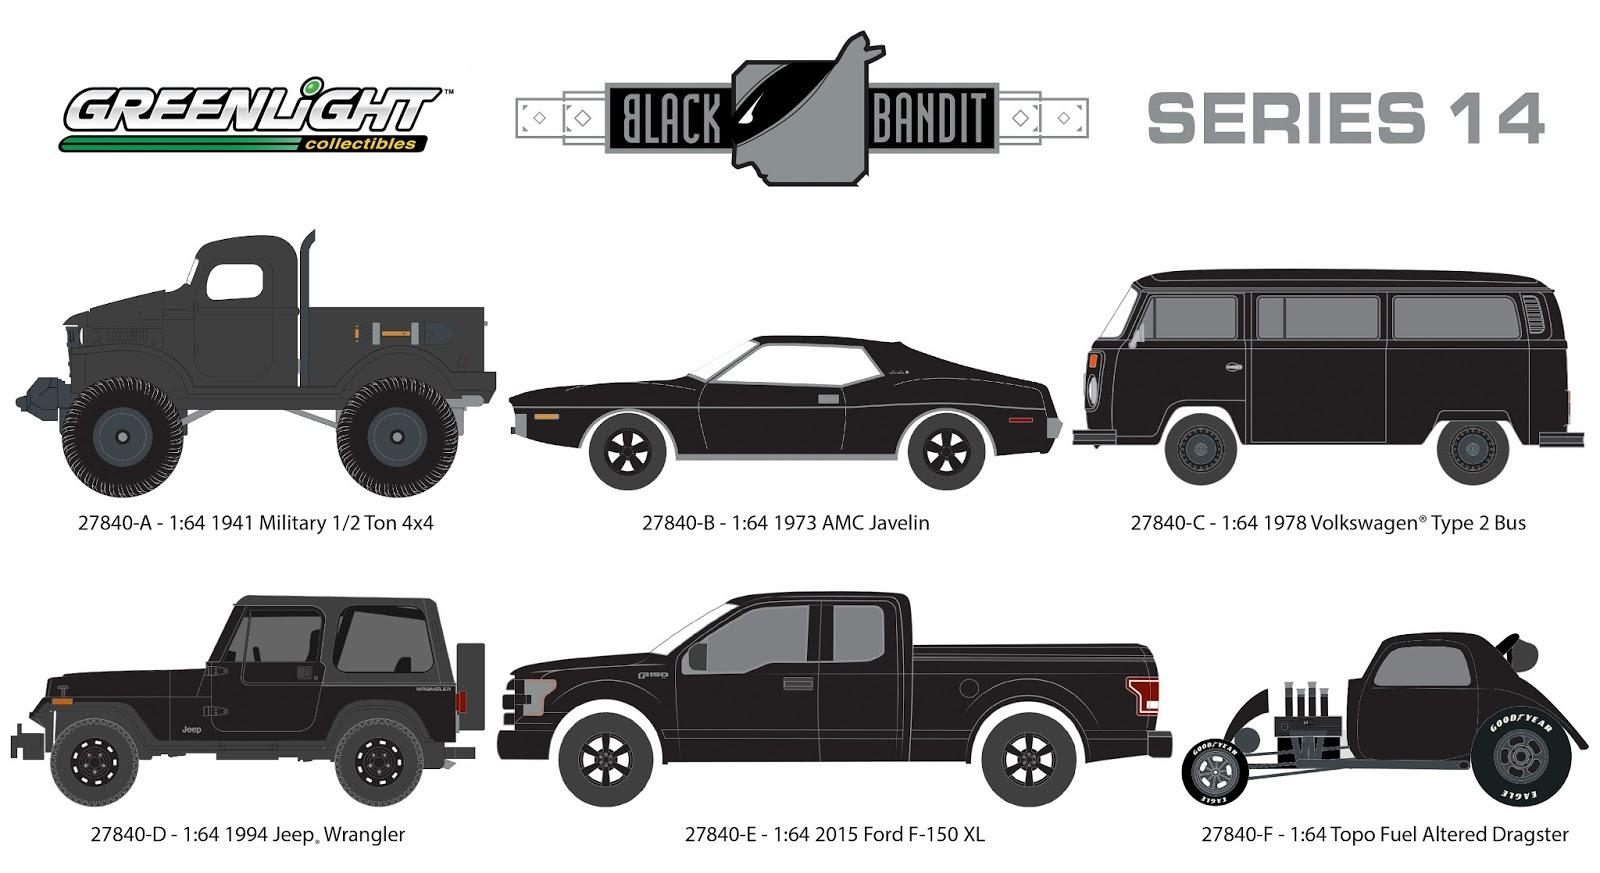 Land Rover Defender 90 Ninety Grün 3 Türer mit Sockel und Vitrine 1//43 Modellc..